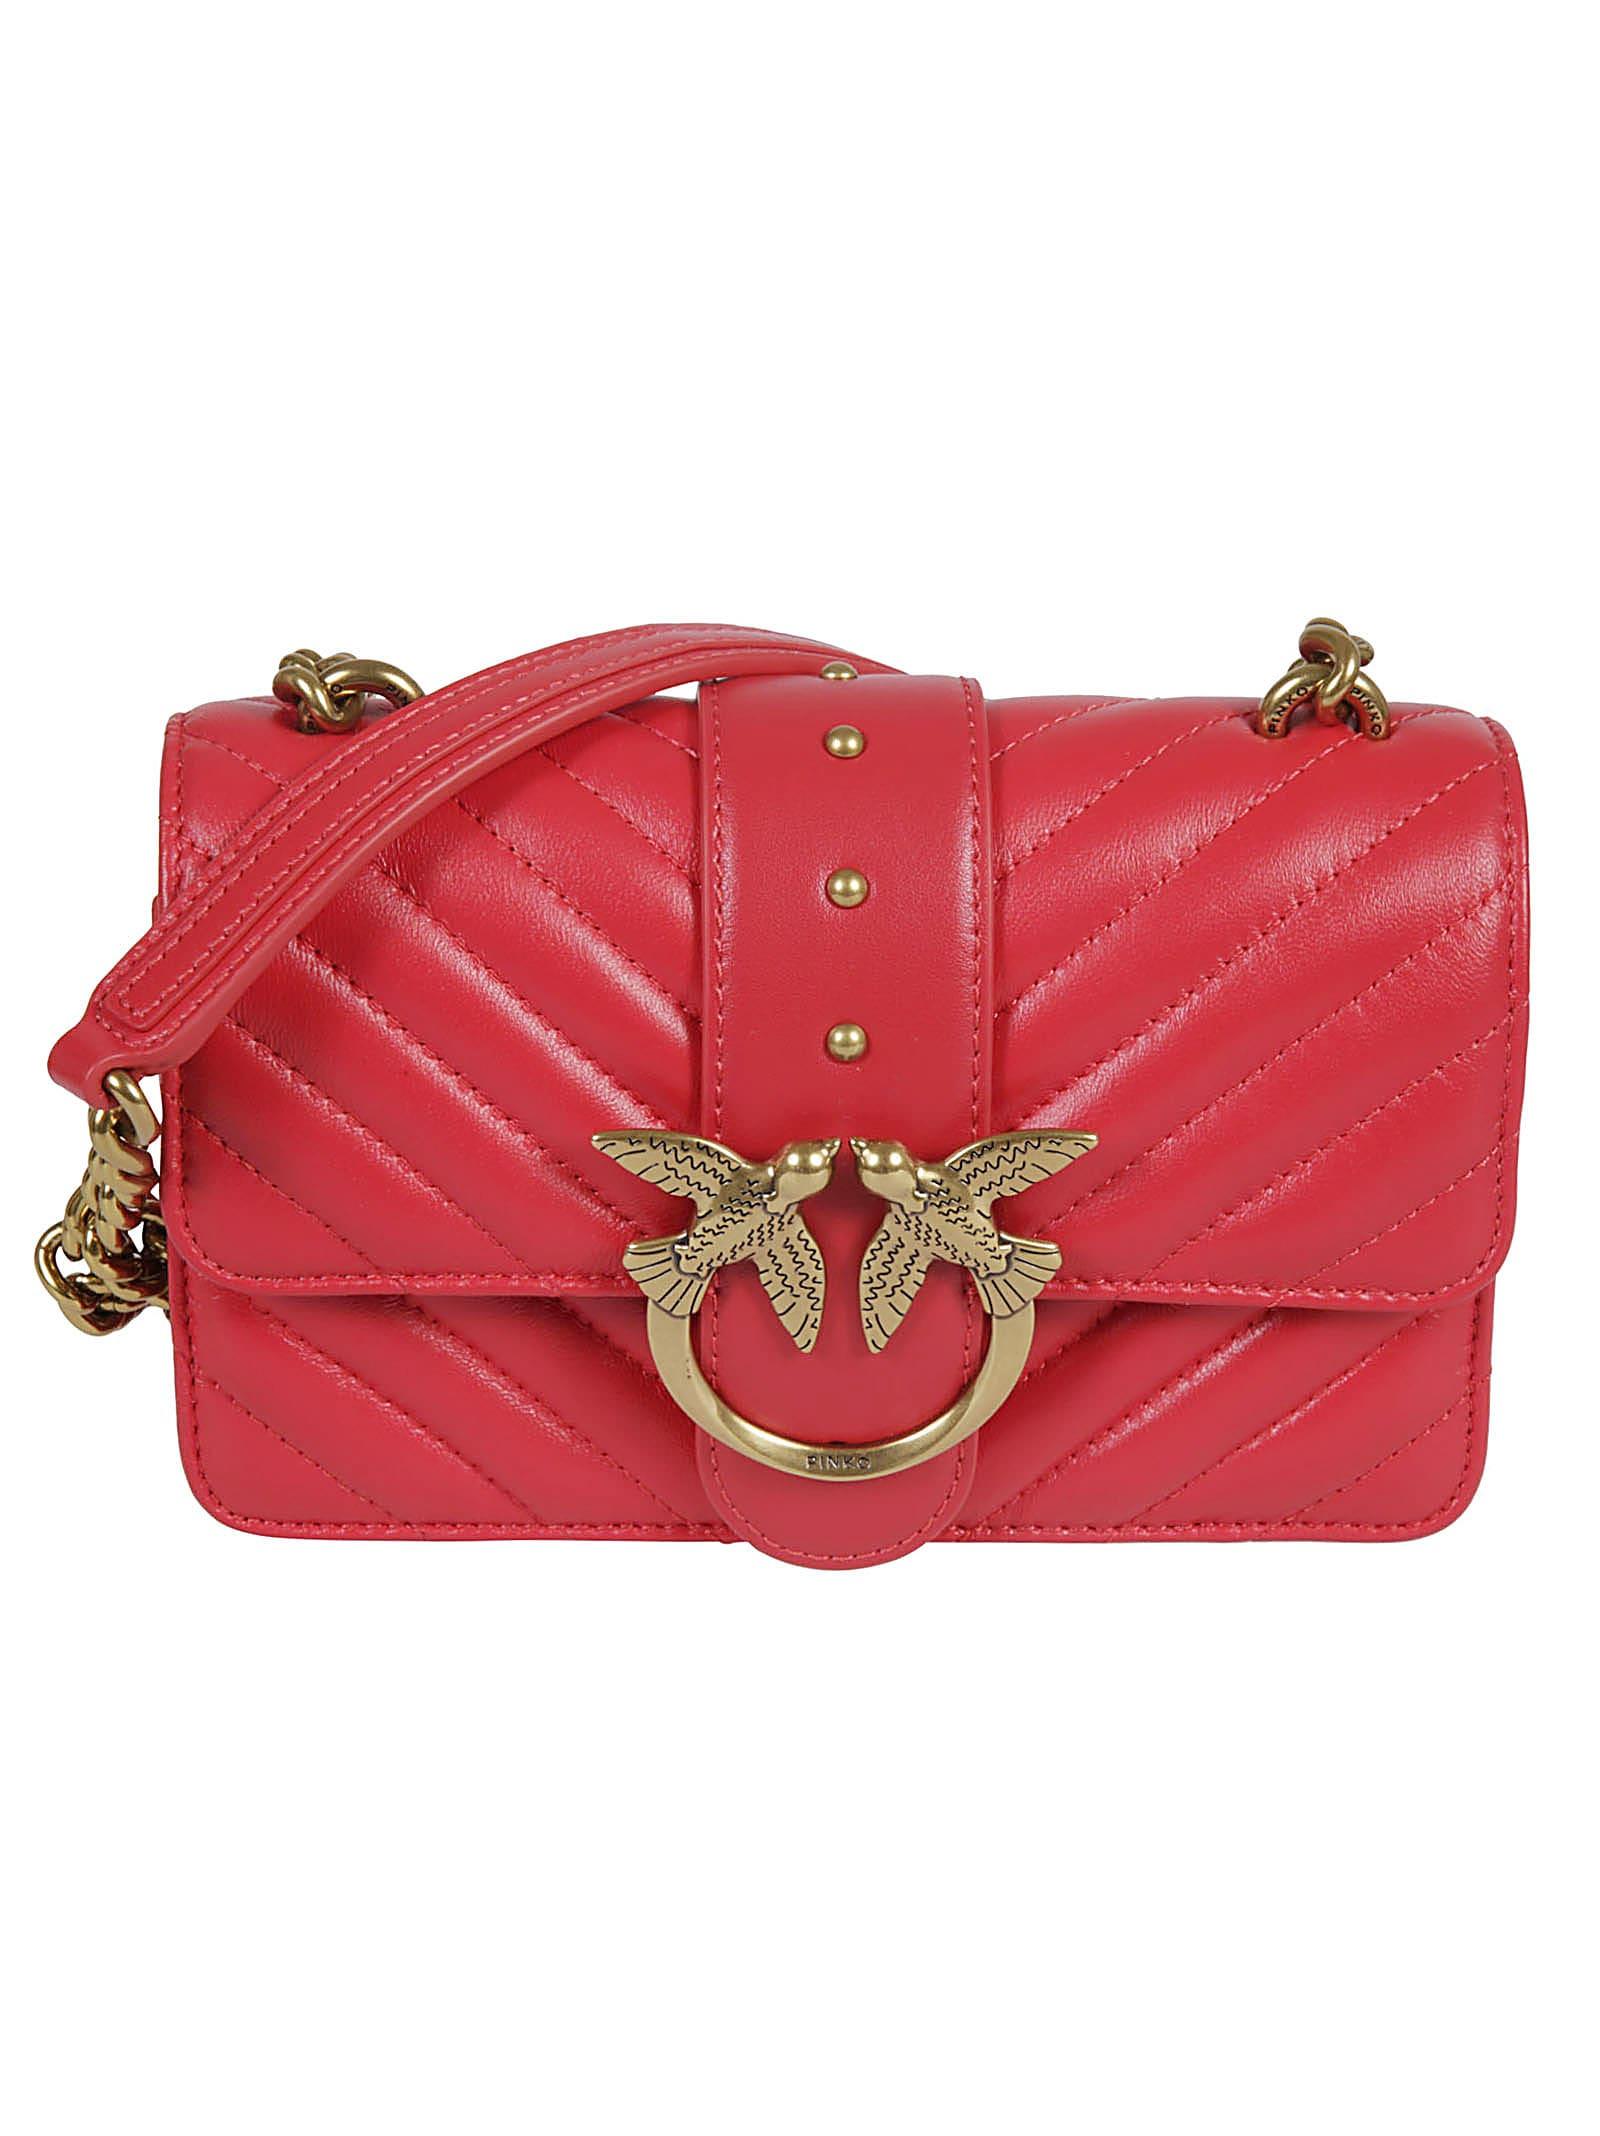 Pinko LOVE MINI ICON V QUILT SHOULDER BAG